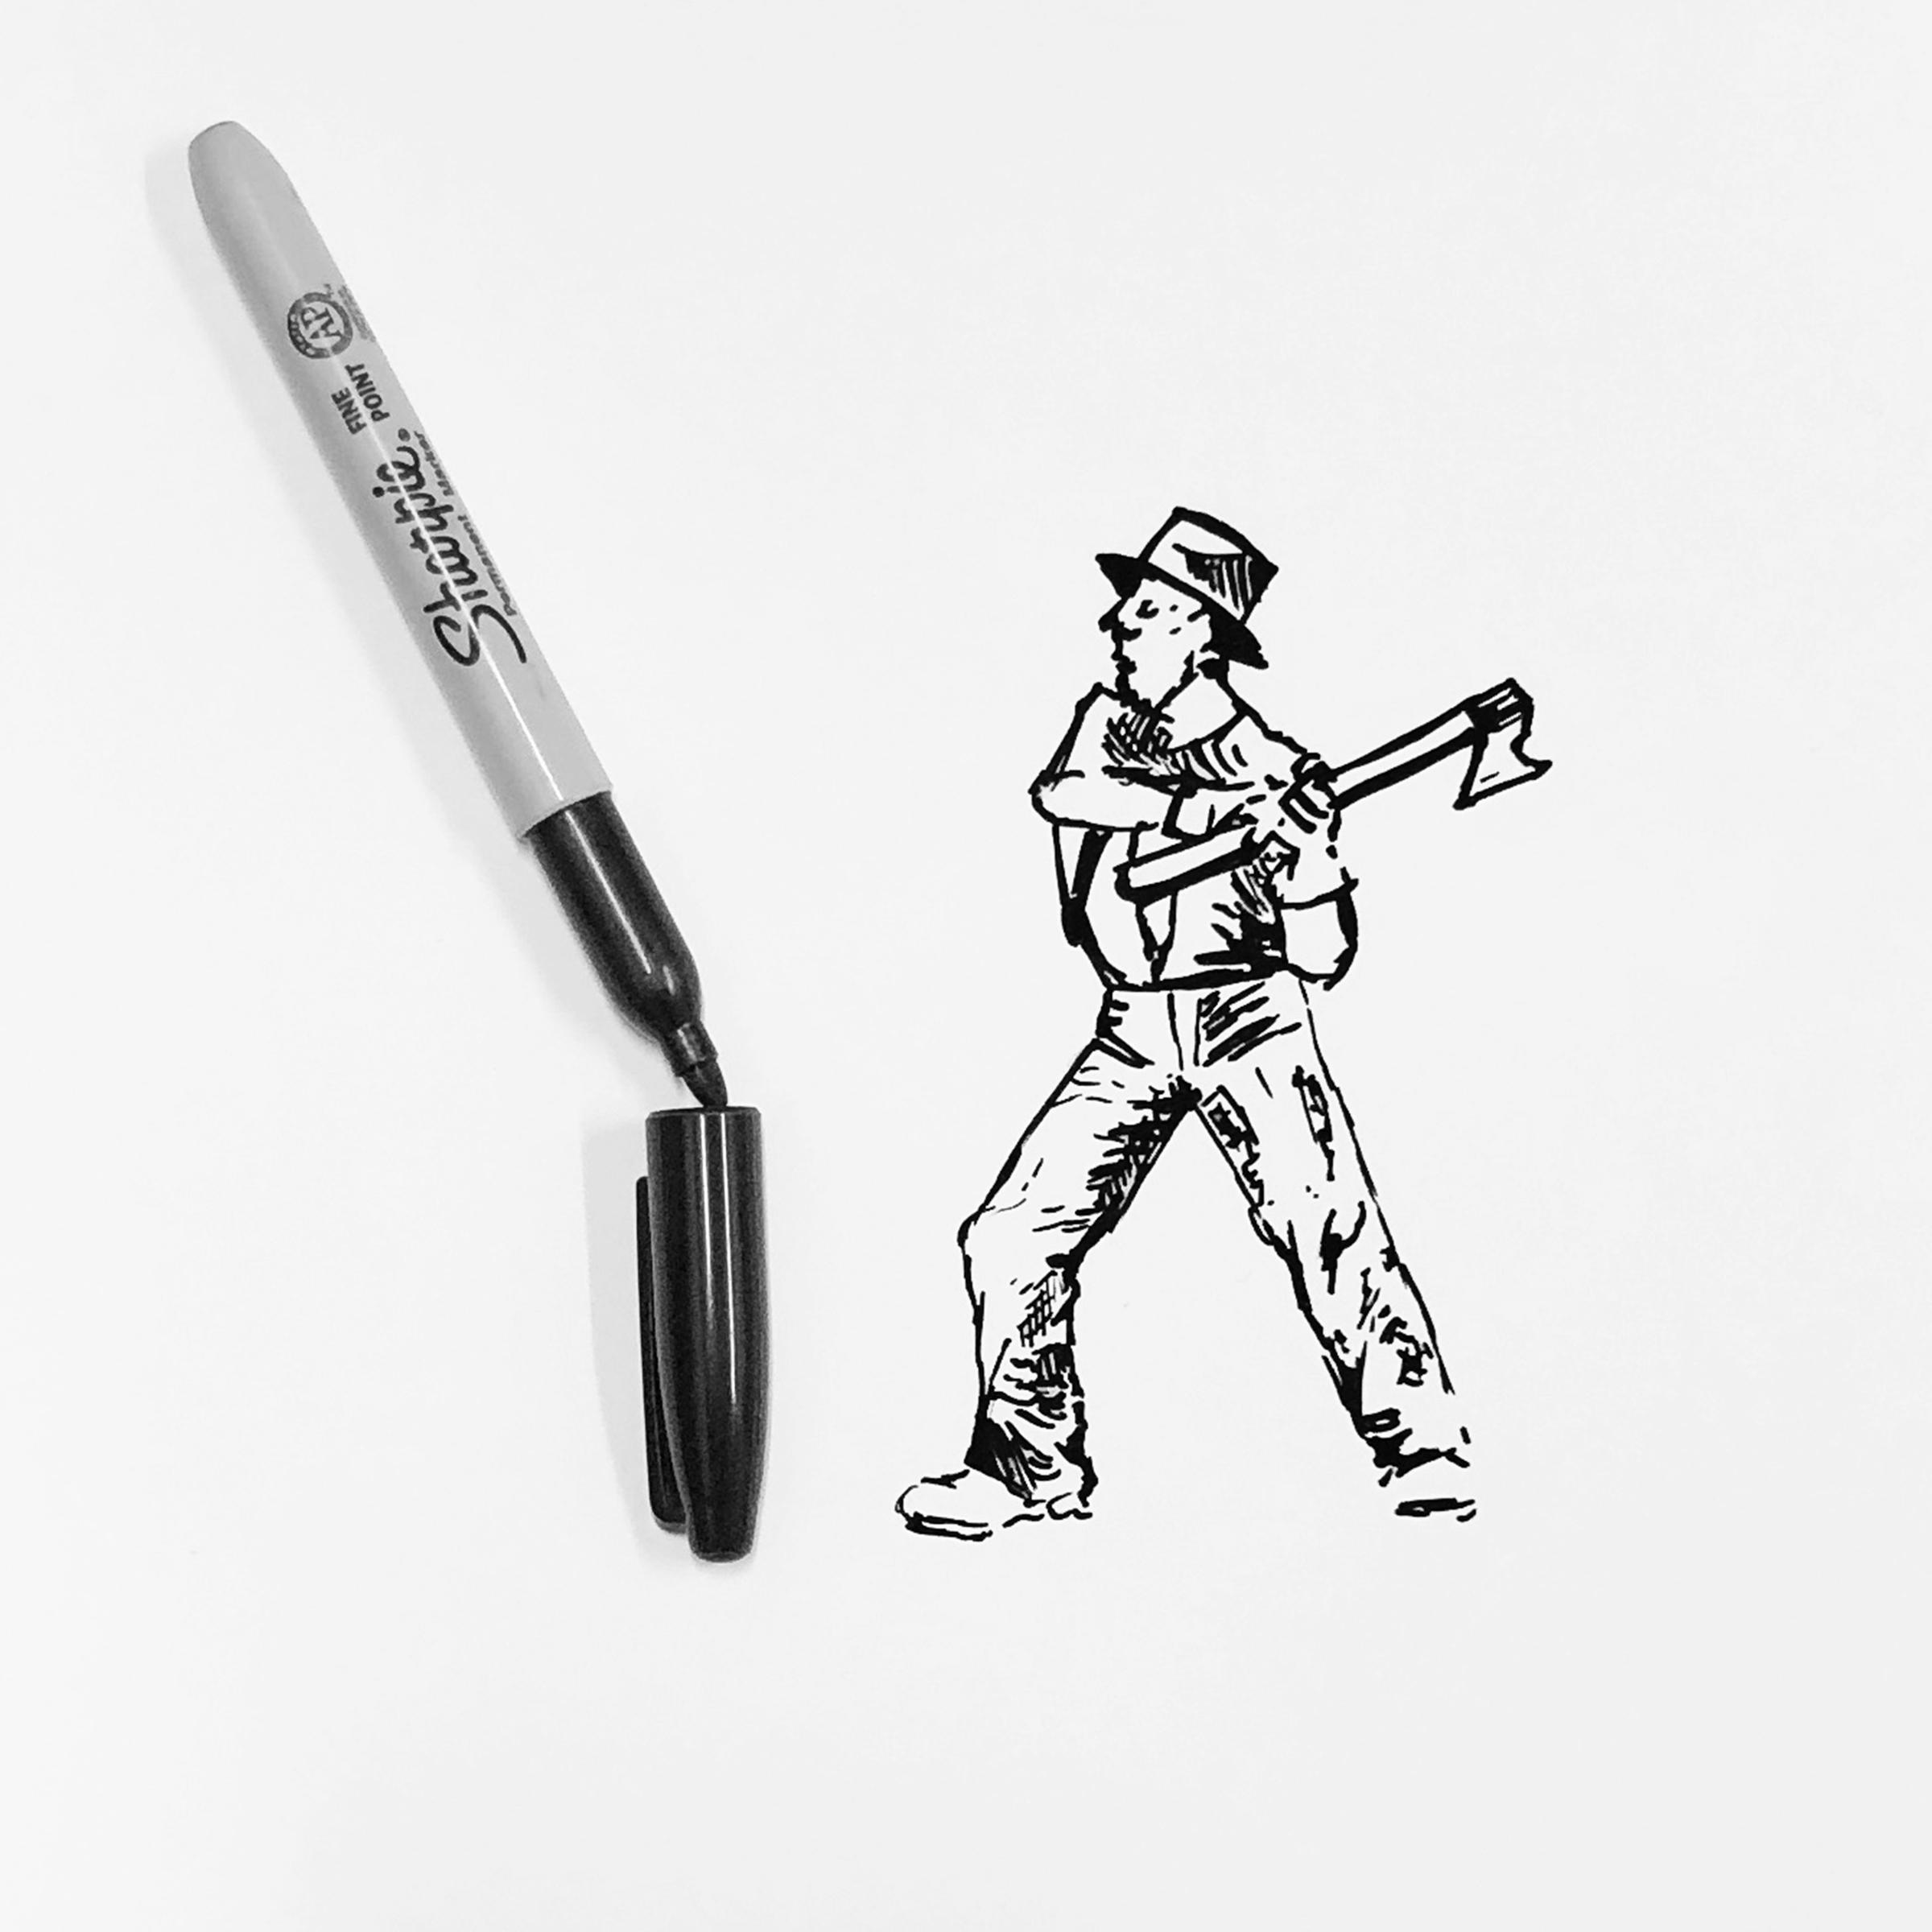 jordan-fretz-sharpie-timber-interactive-drawing-2.jpg